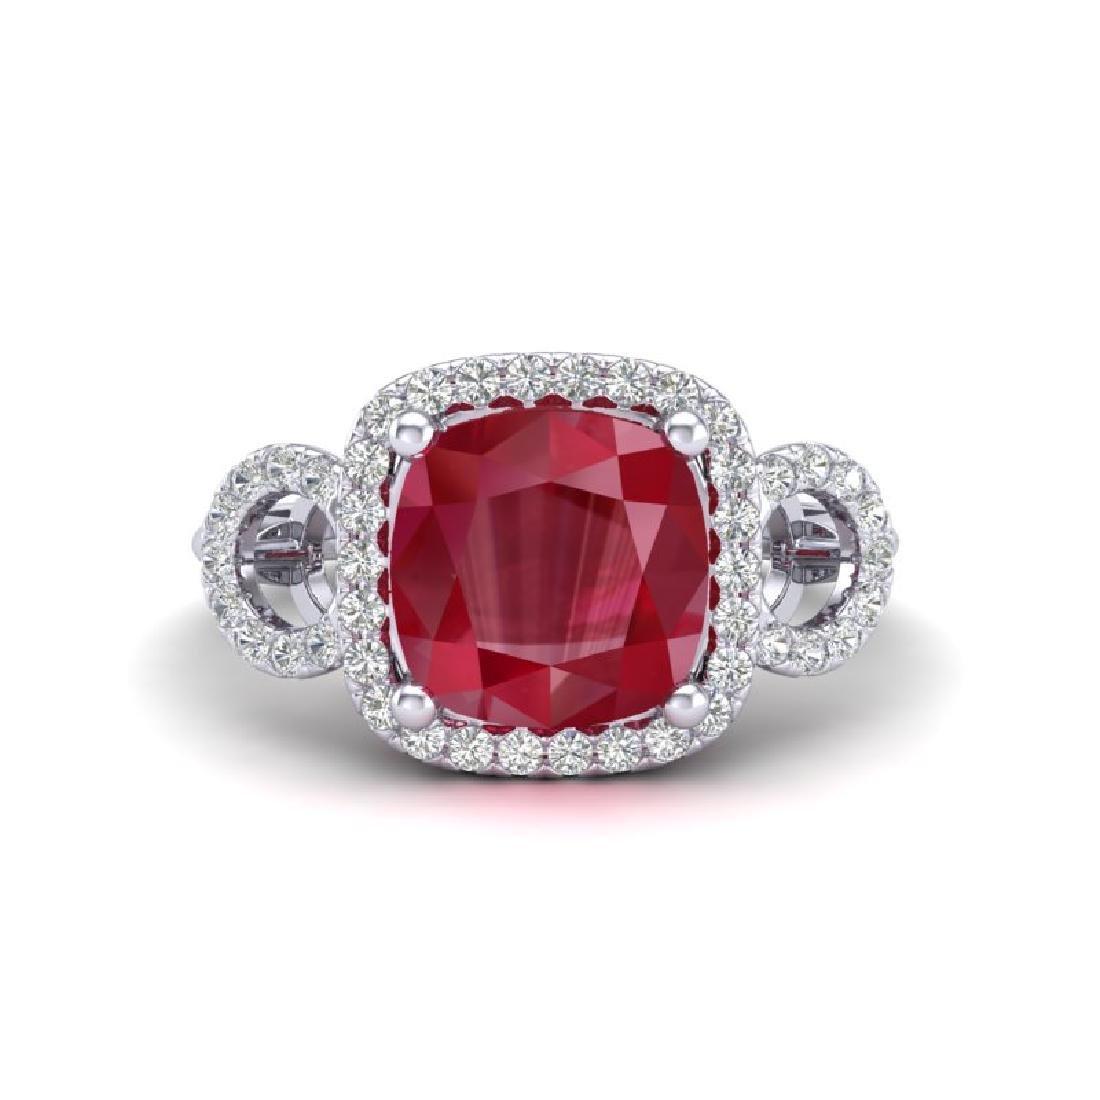 3.15 CTW Ruby & Micro VS/SI Diamond Ring 18K White Gold